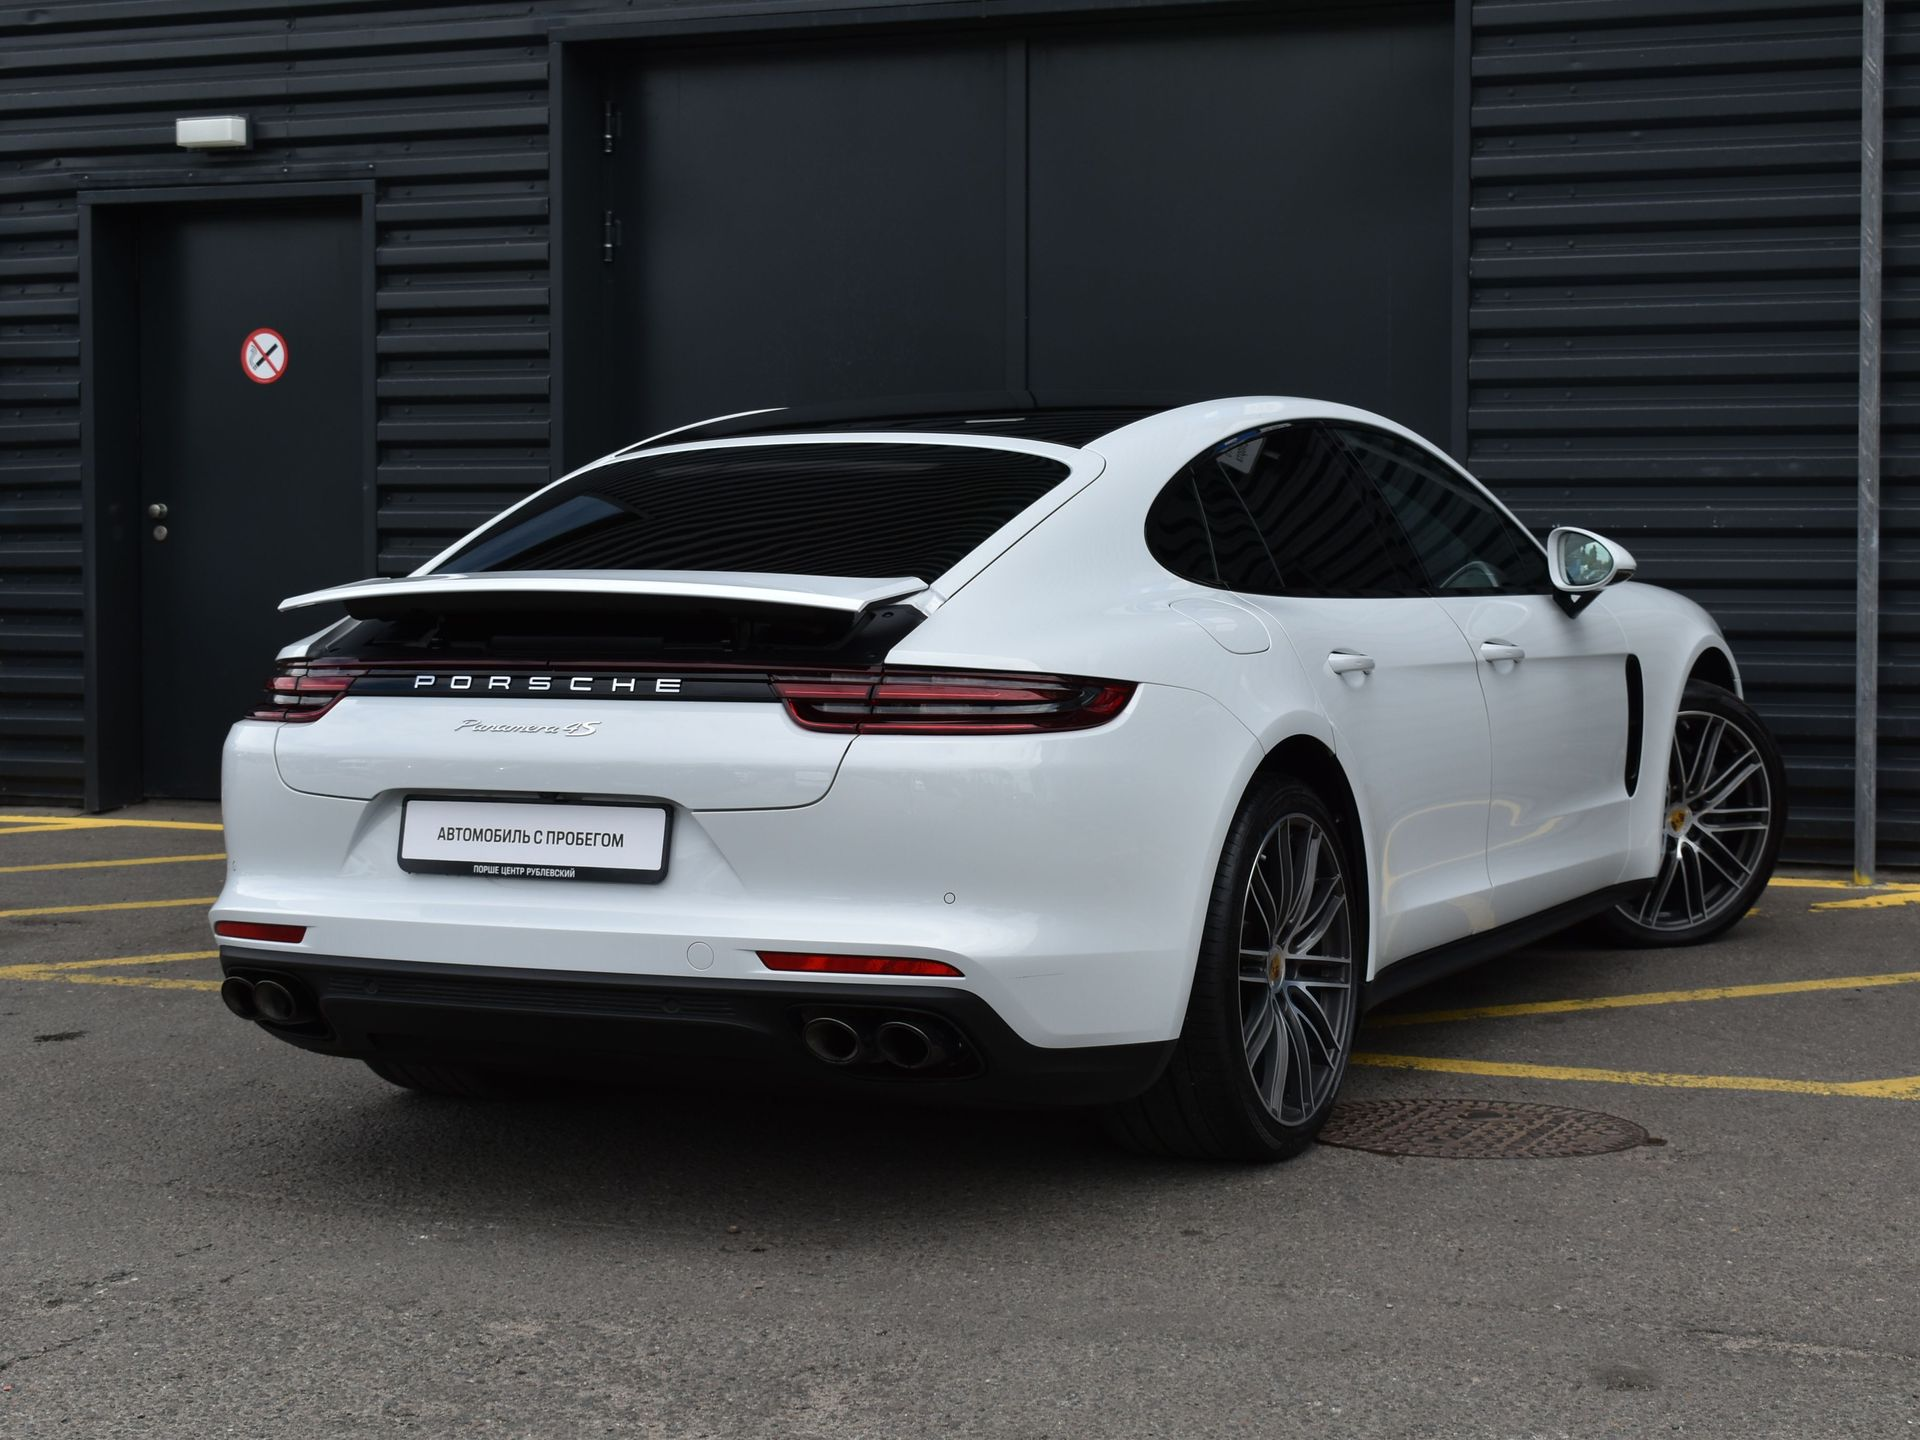 2017 Porsche Panamera 4S – 2